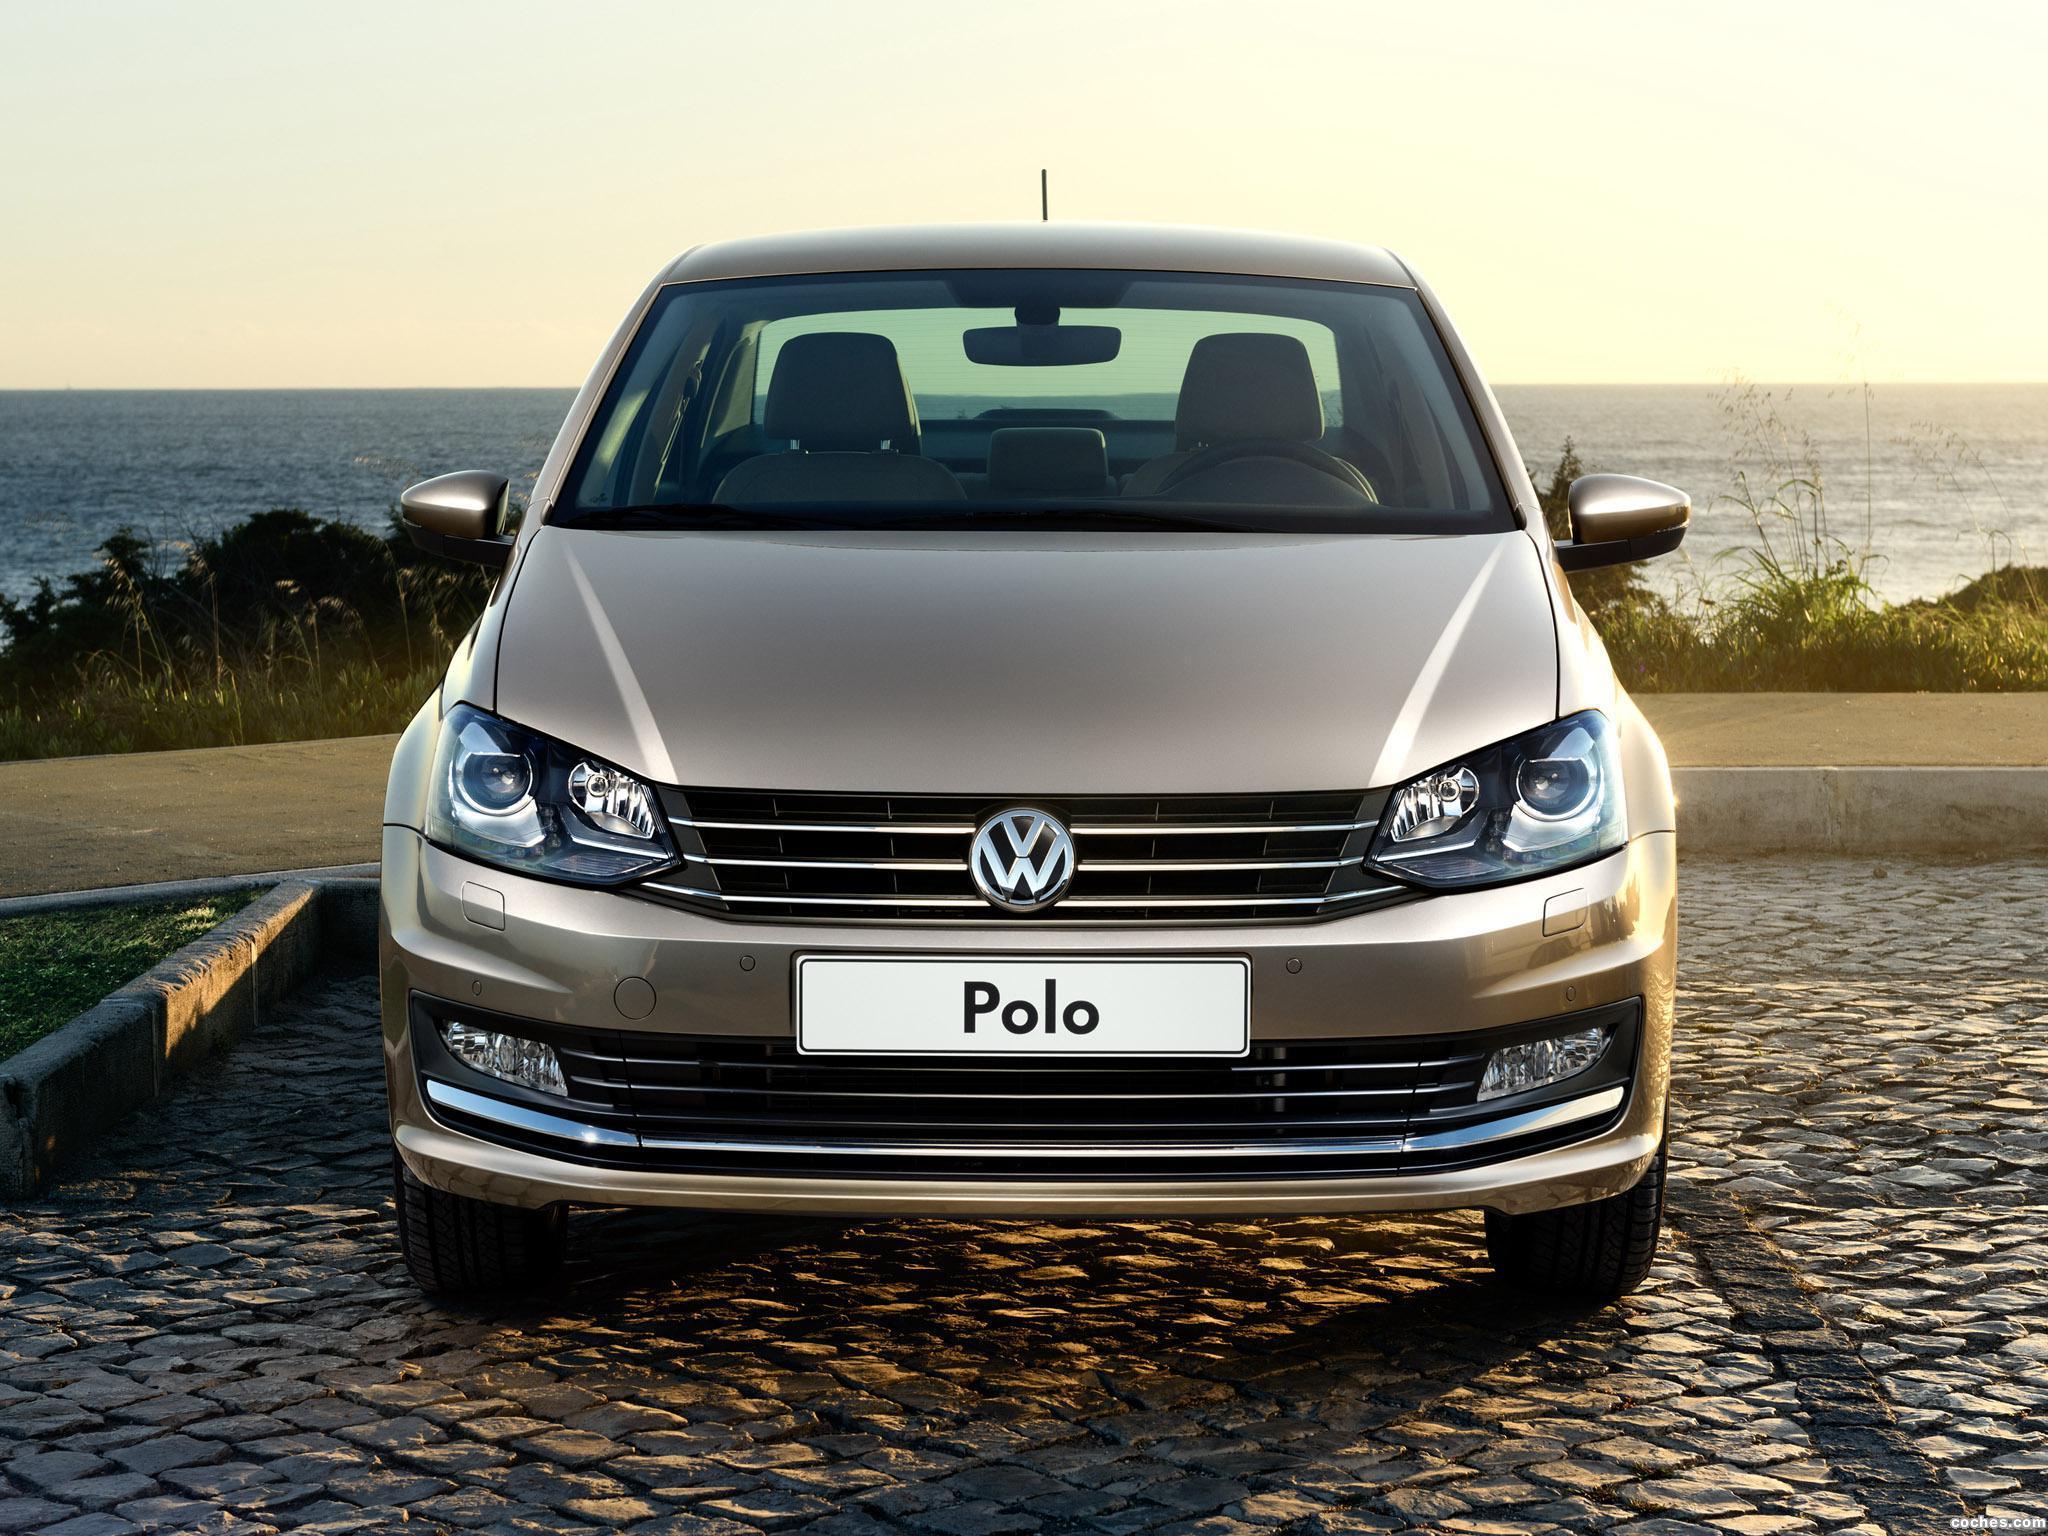 Foto 27 de Volkswagen Polo Sedan 2015